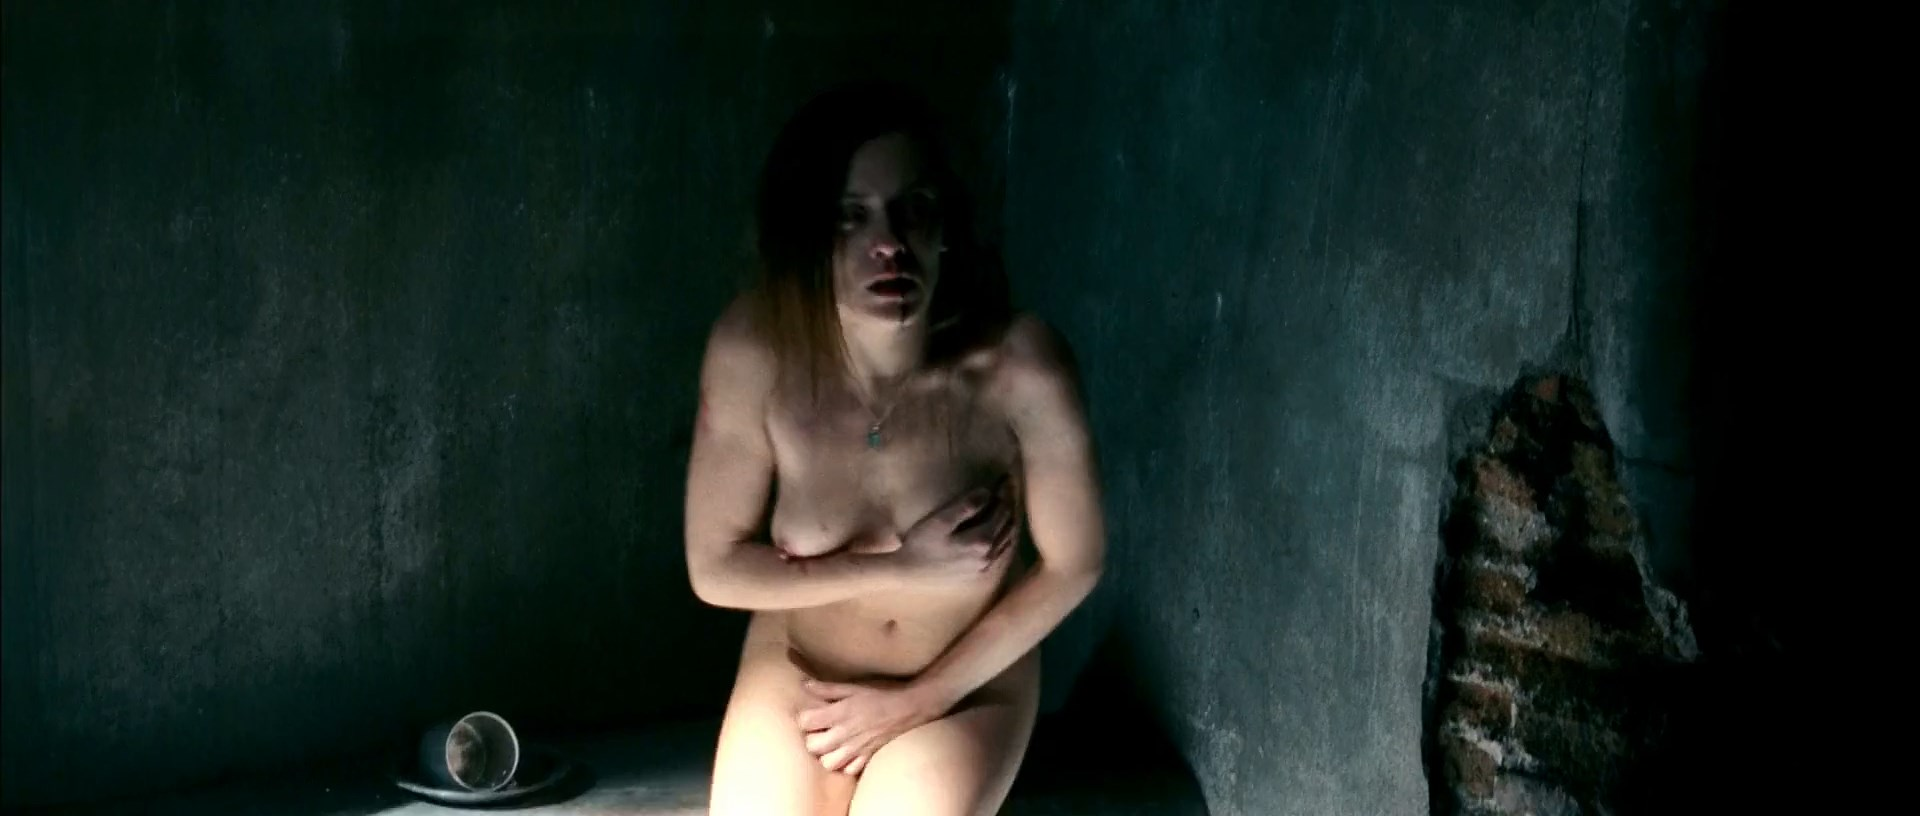 Maria naked videos